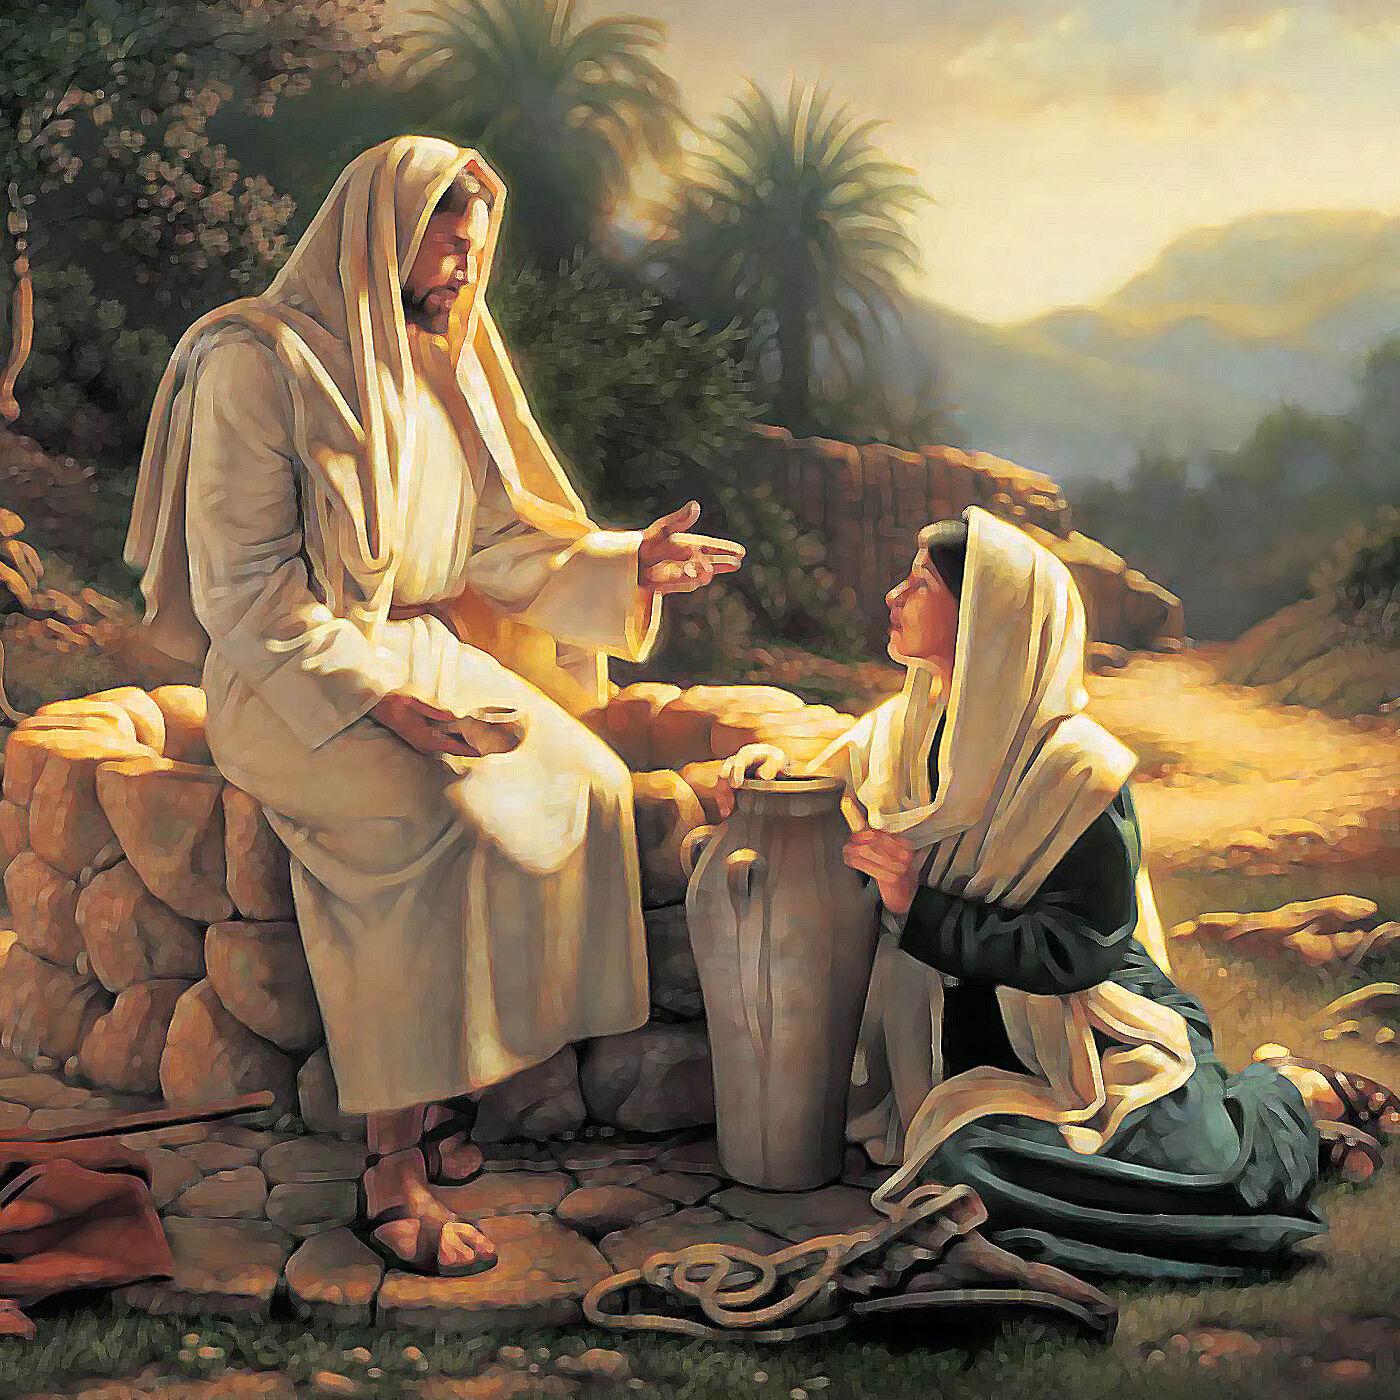 riflessioni sul Vangelo di Venerdì 22 Gennaio 2021 (Mc 3, 13-19)